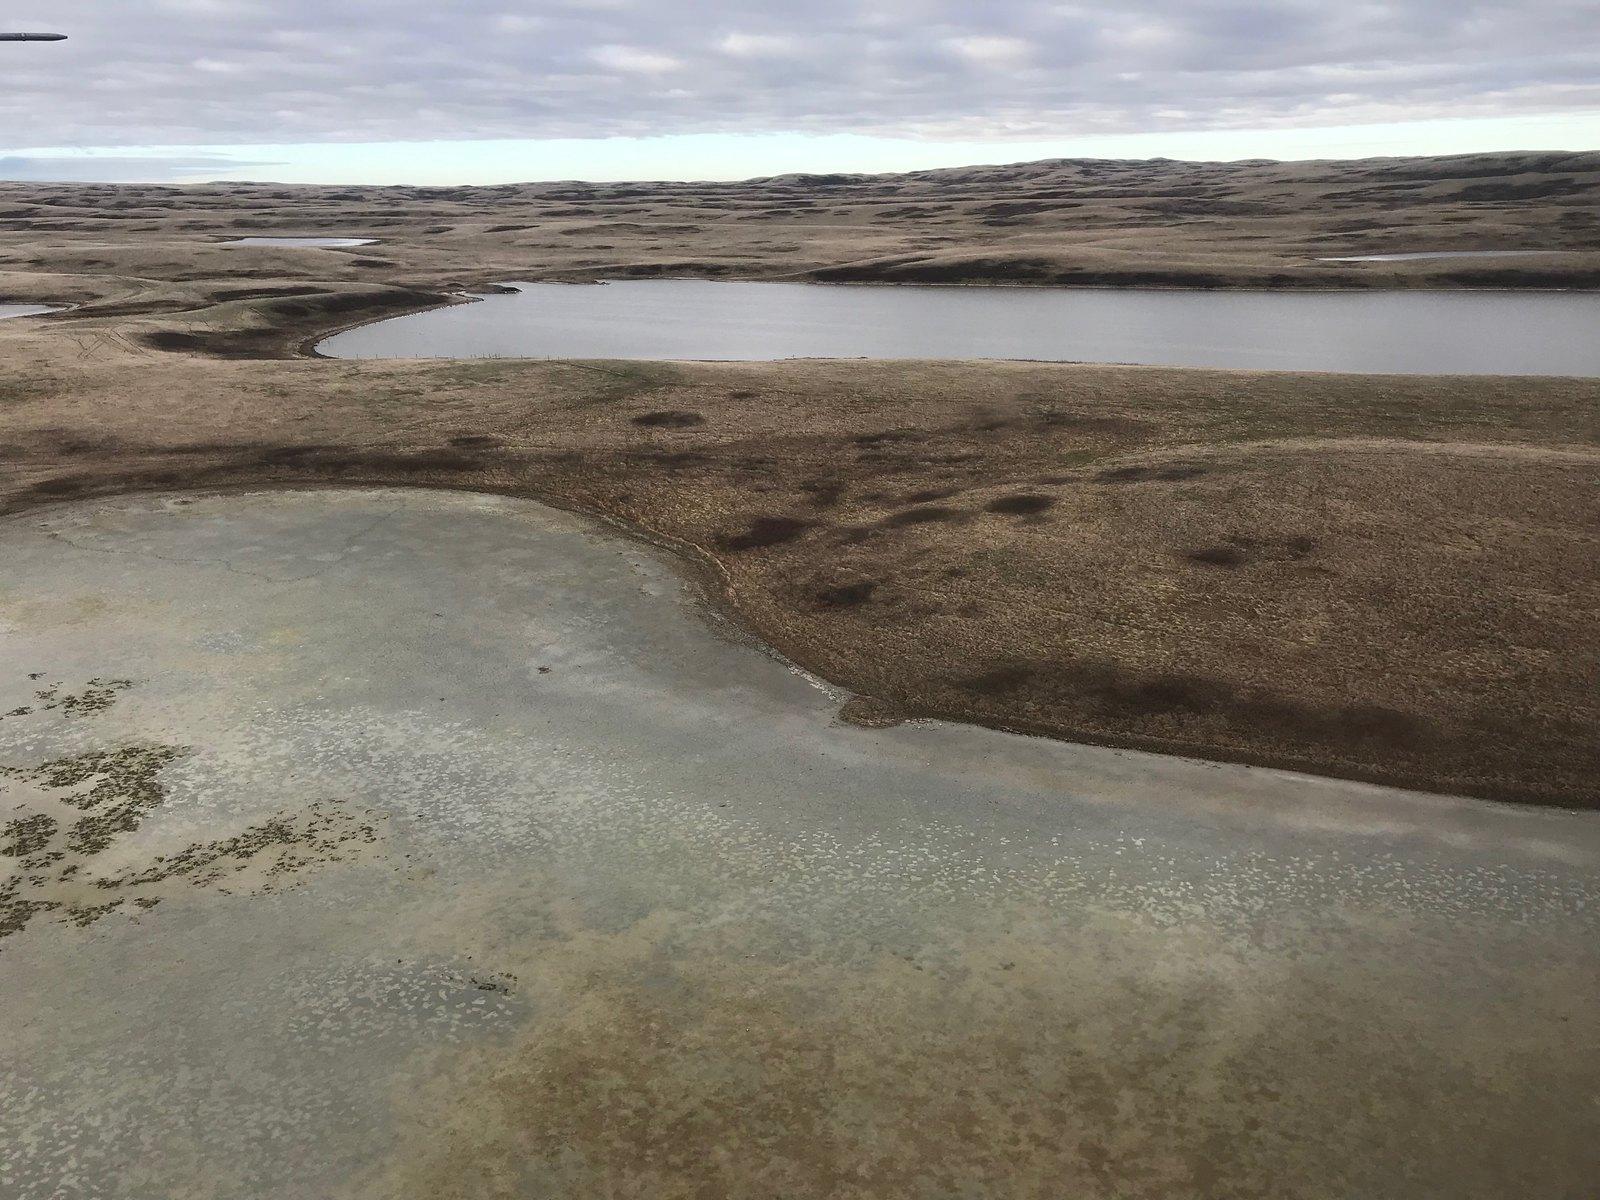 Dry conditions near the Manitoba-Saskatchewan border. Photo Credit: Jeff Drahota, USFWS